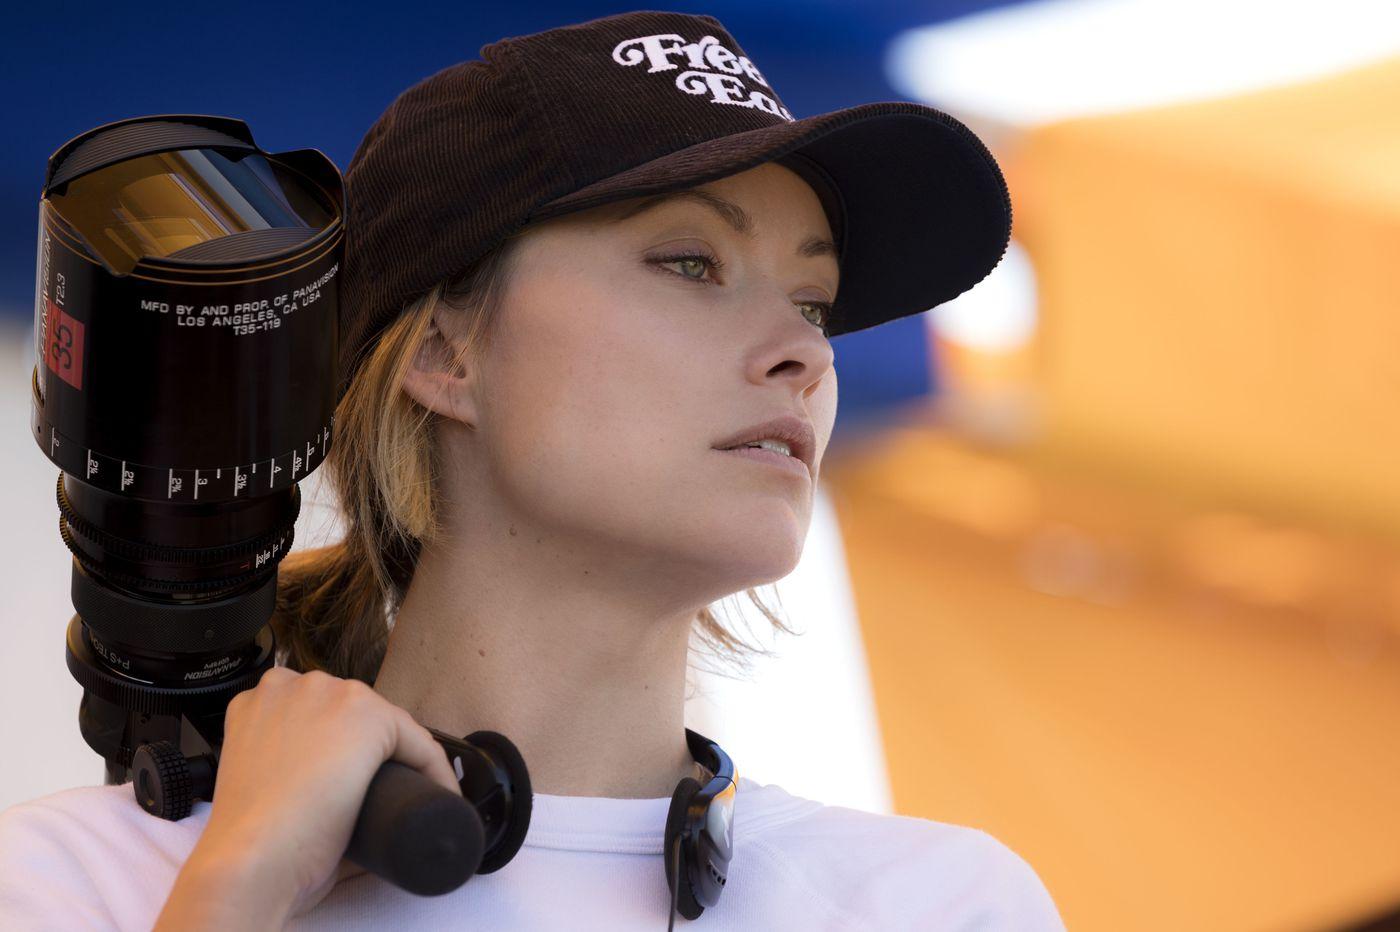 Olivia Wilde dirigirá el thriller Don't Worry Darling con New Line Cinema